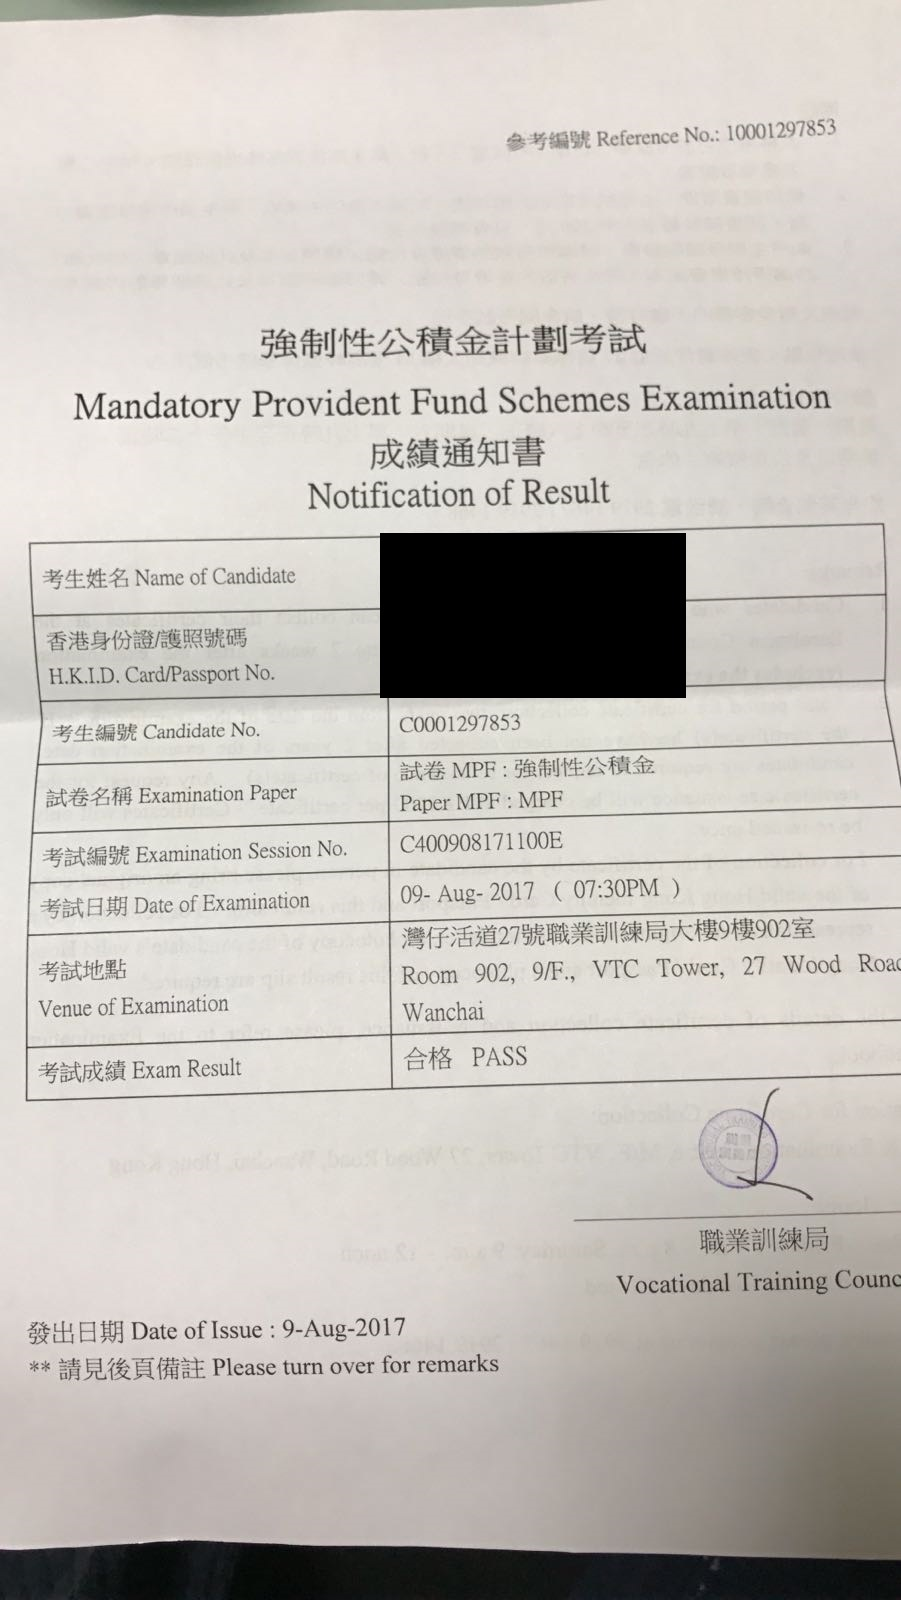 CST 9/8/2017 MPFE 強積金中介人資格考試 Pass